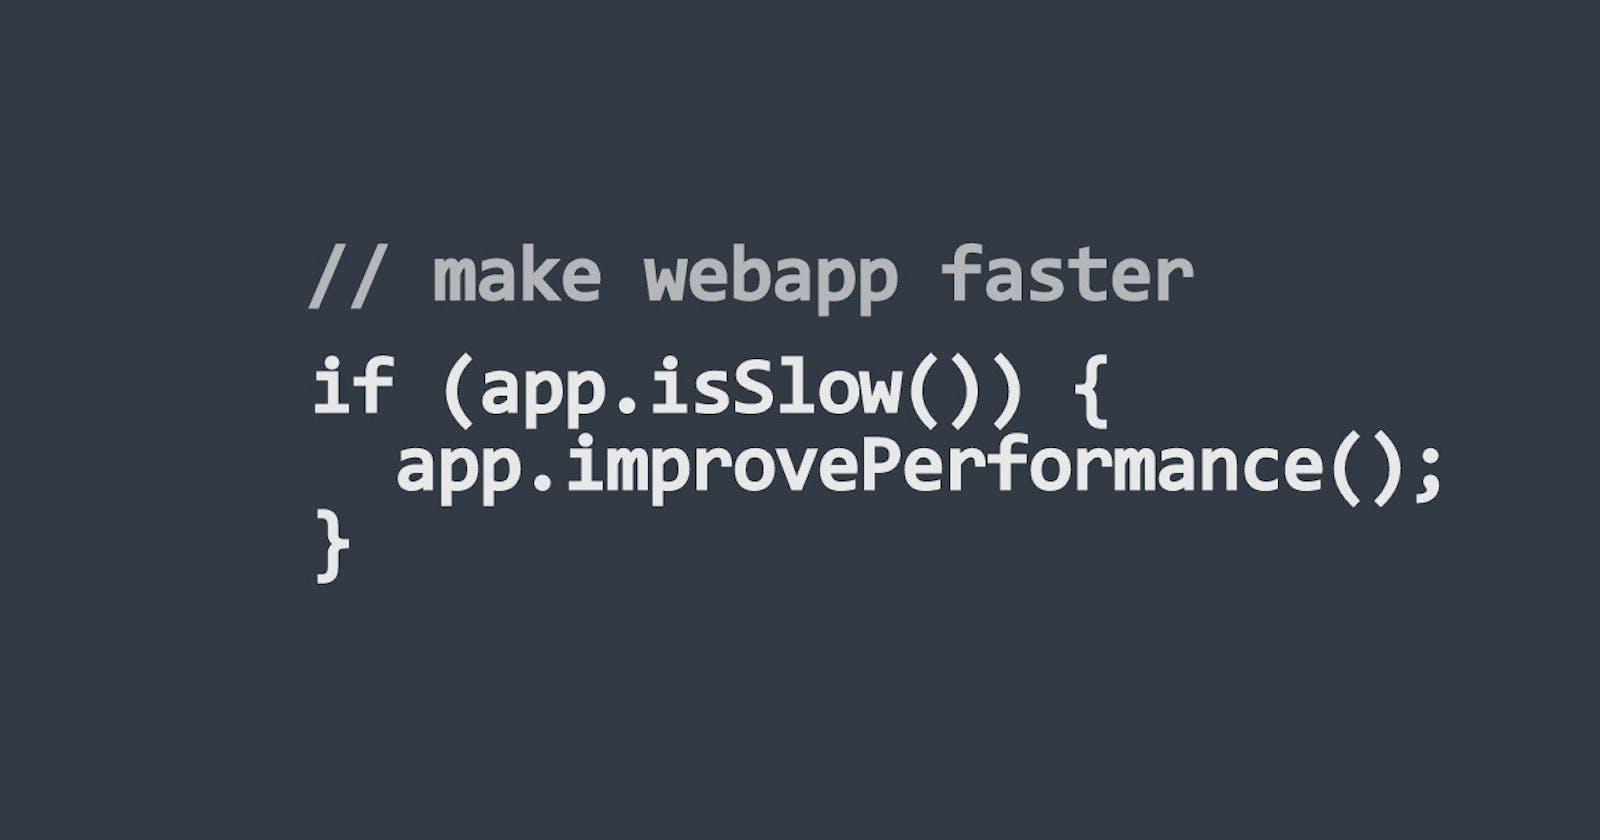 What makes your web app faster? (part 3, Client App)